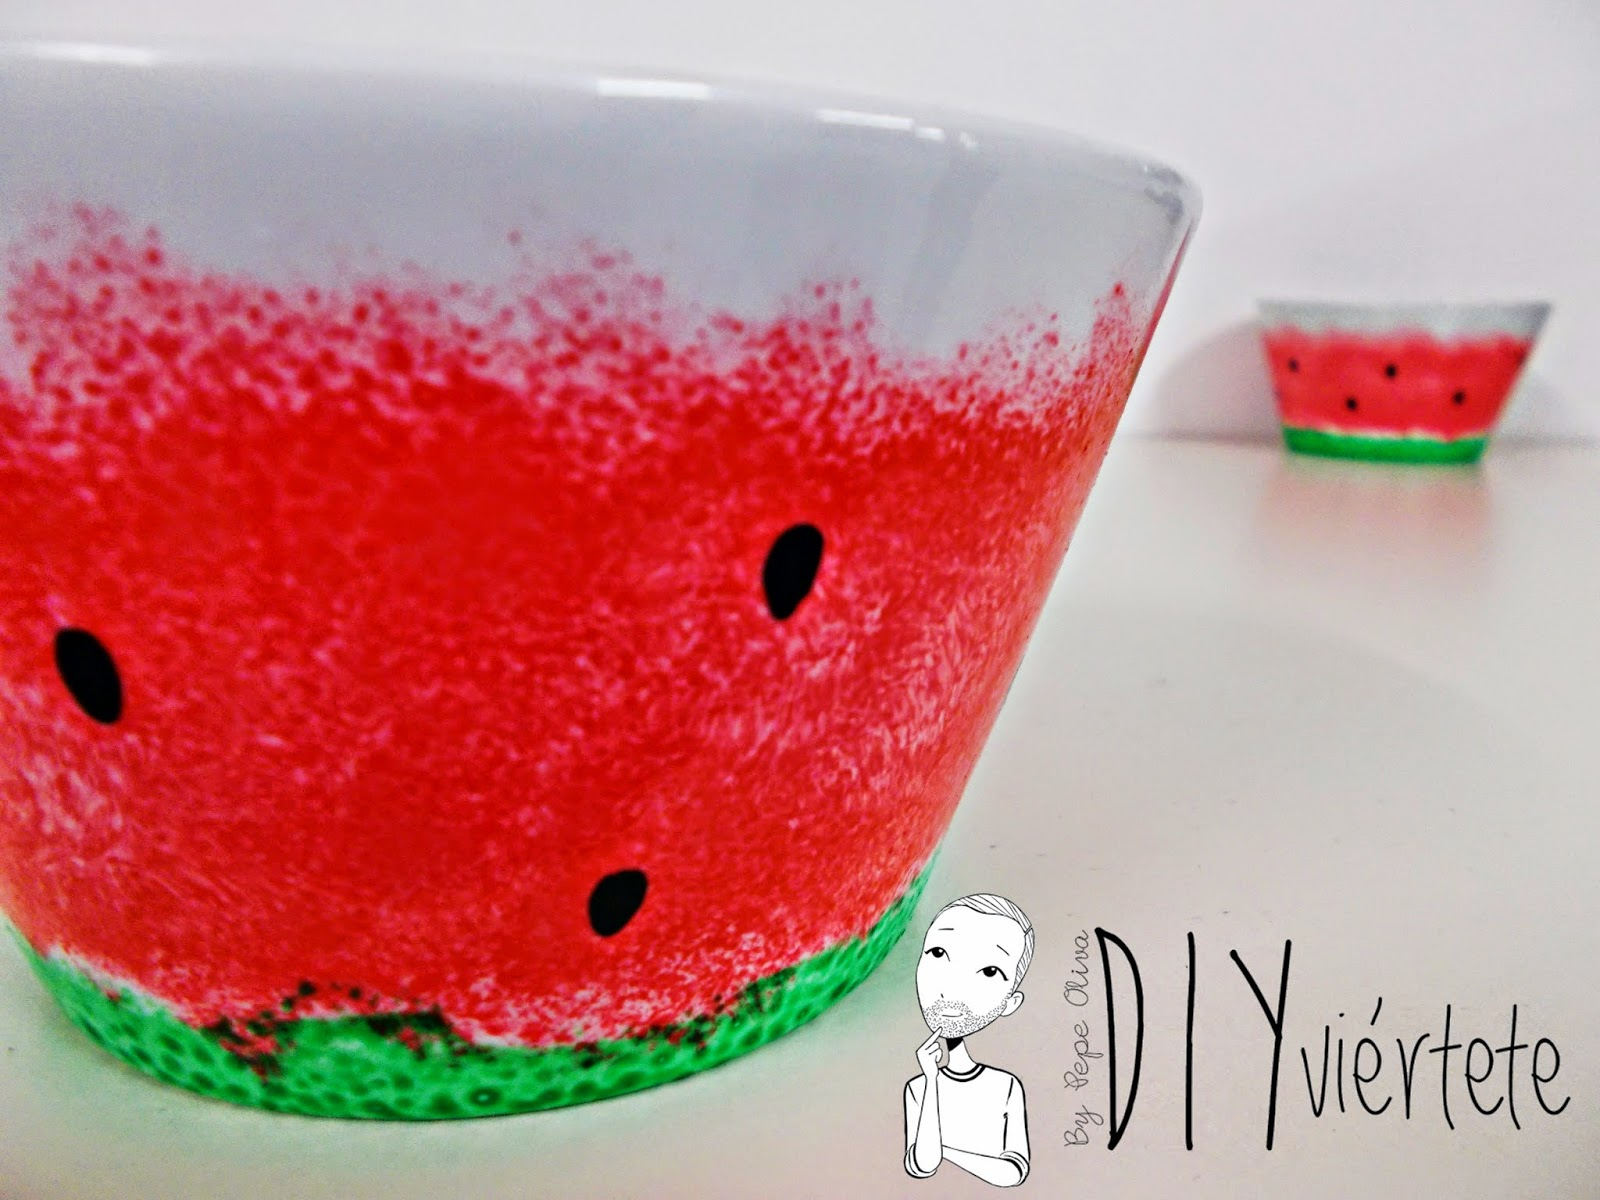 DIY-porcelana-pintar-porcelain-porzellan-sandía-DIYviertete-7